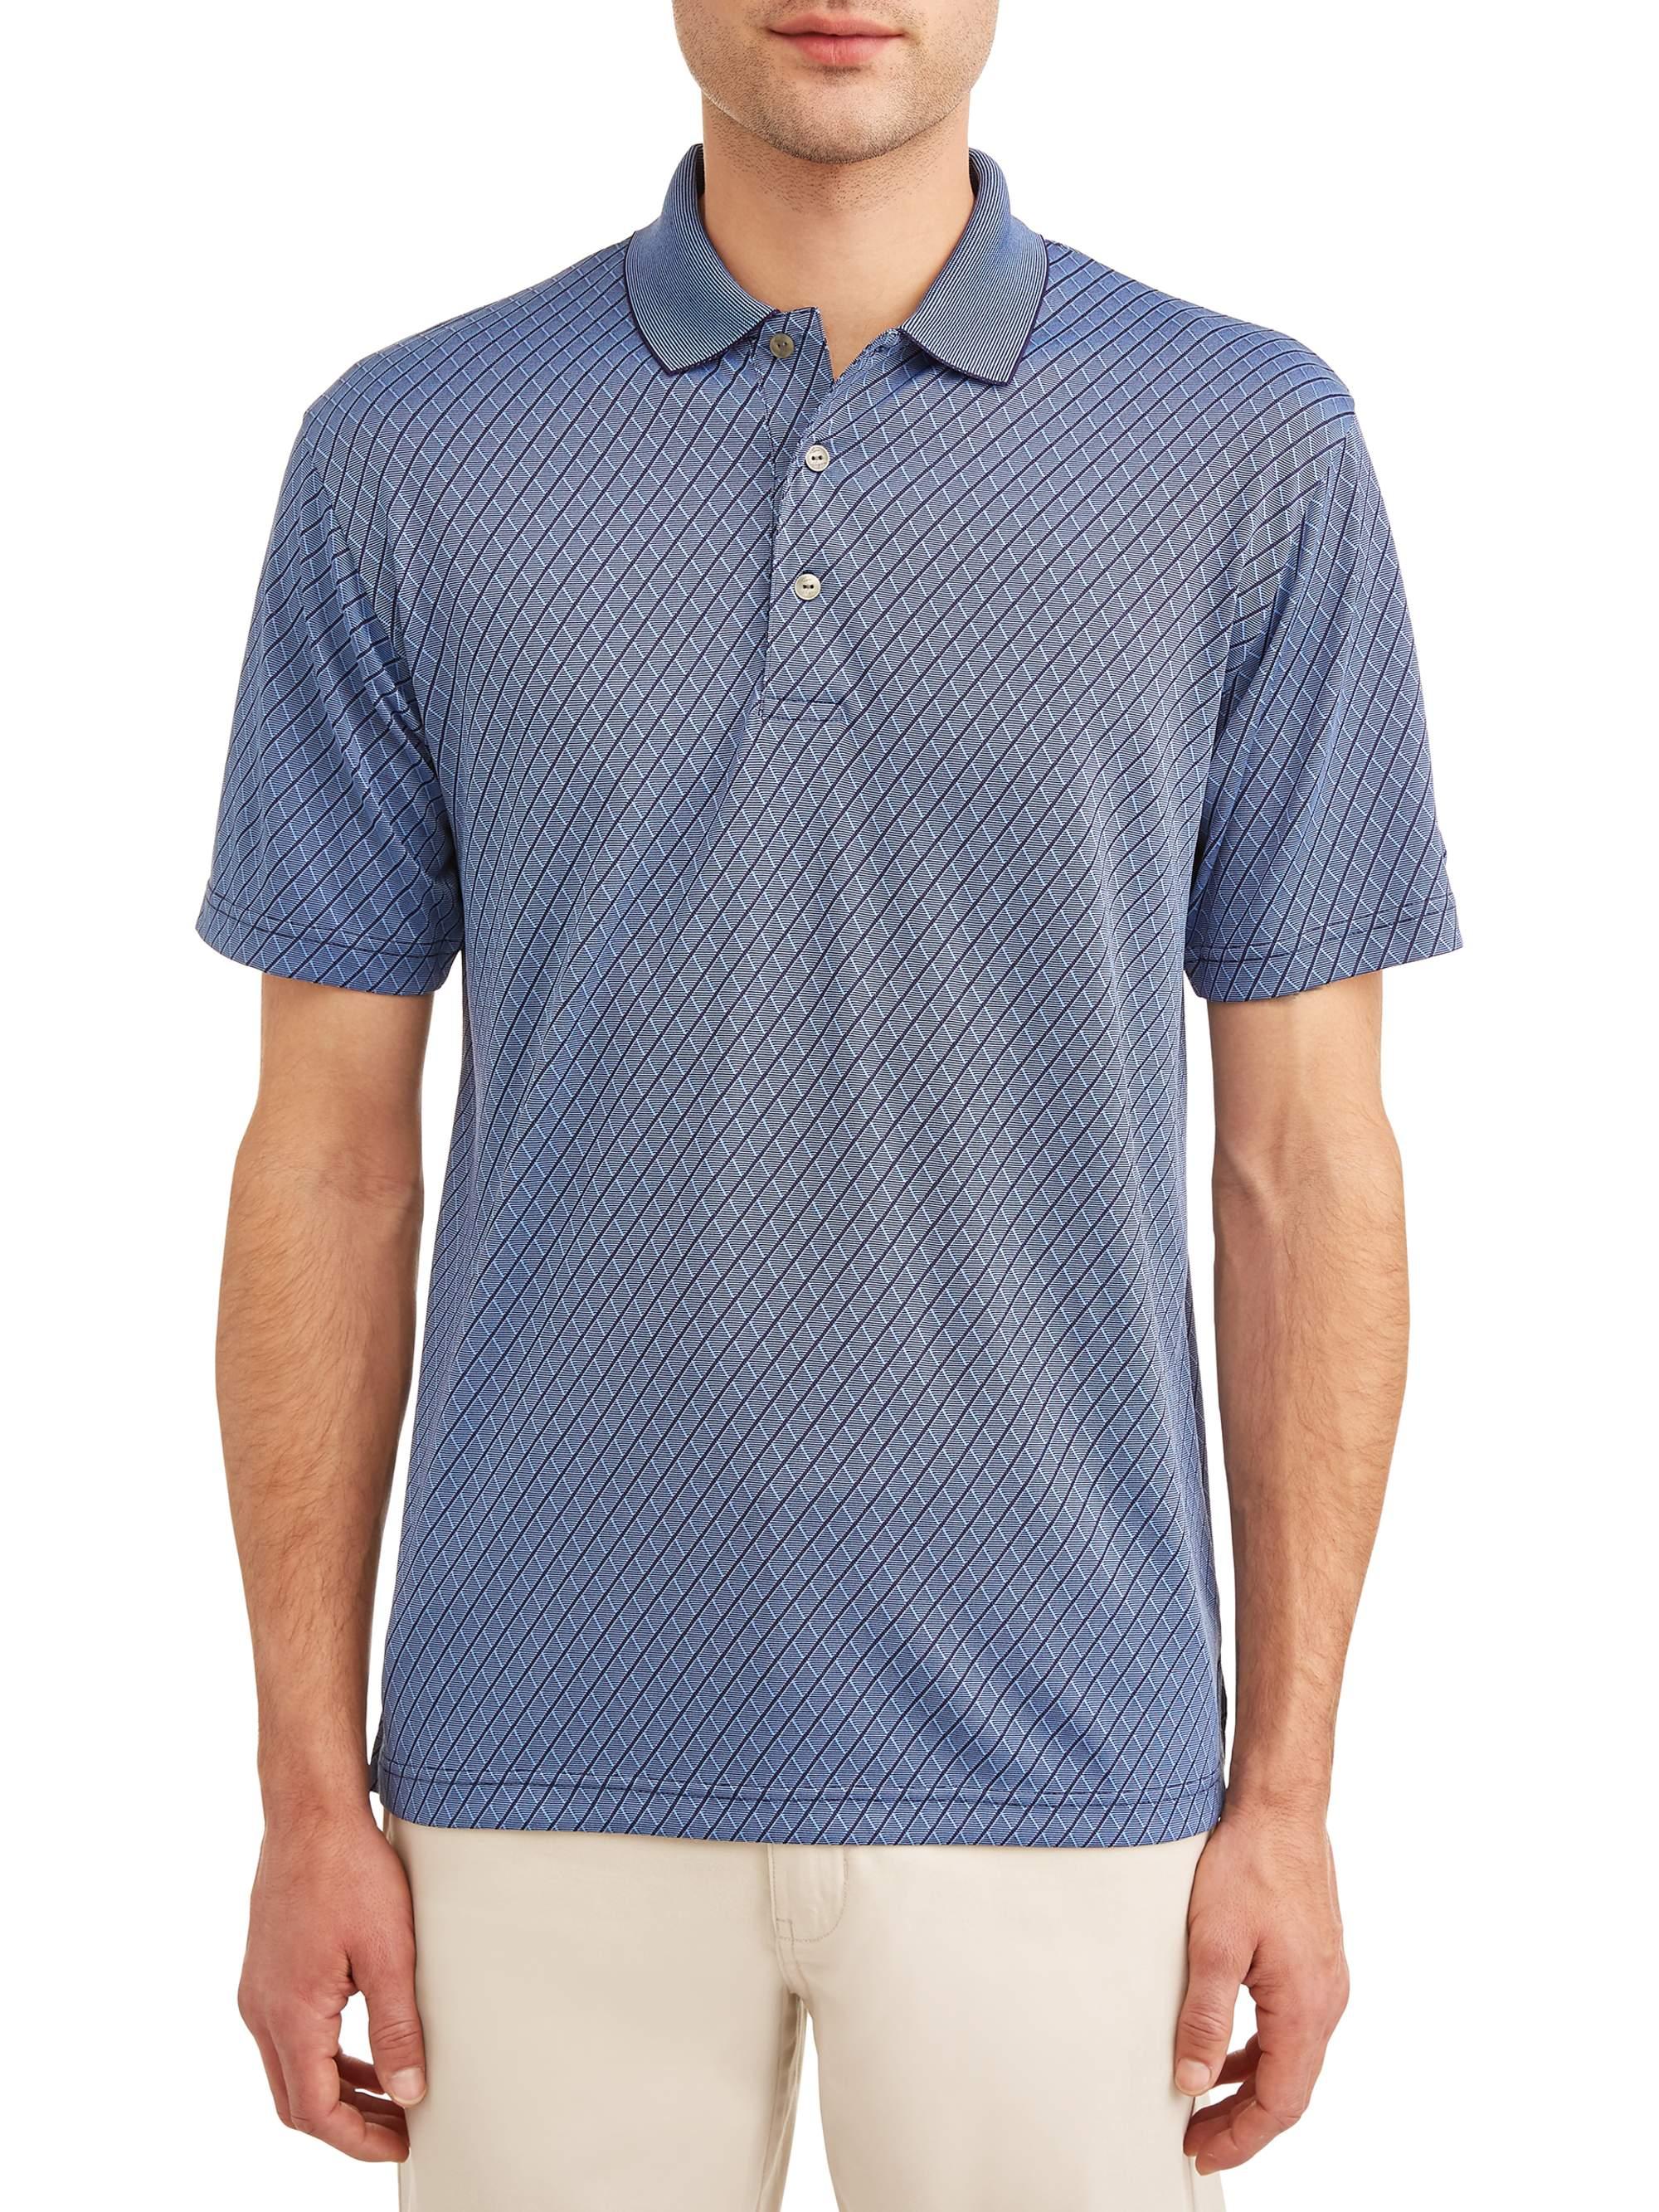 Men's Performance Short Sleeve Textured Polo Shirt